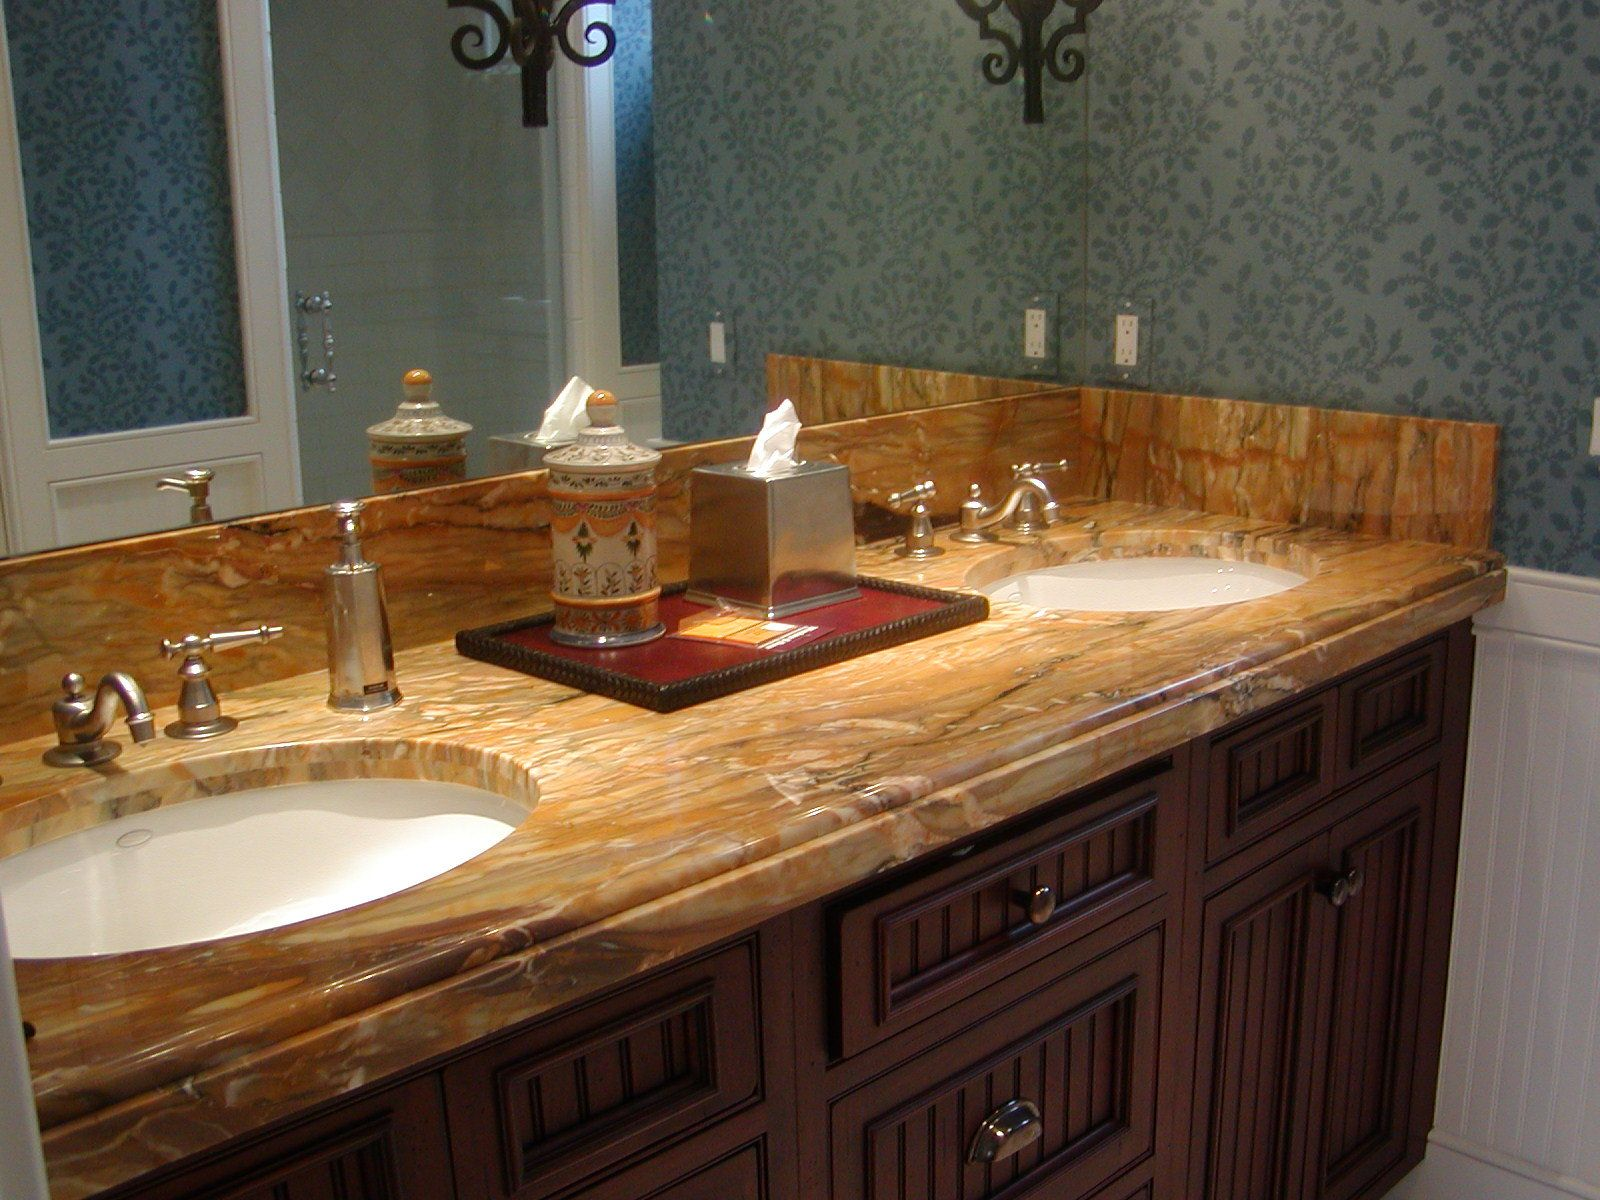 Countertop Gallery Countertops White Granite Bathroom Vanity